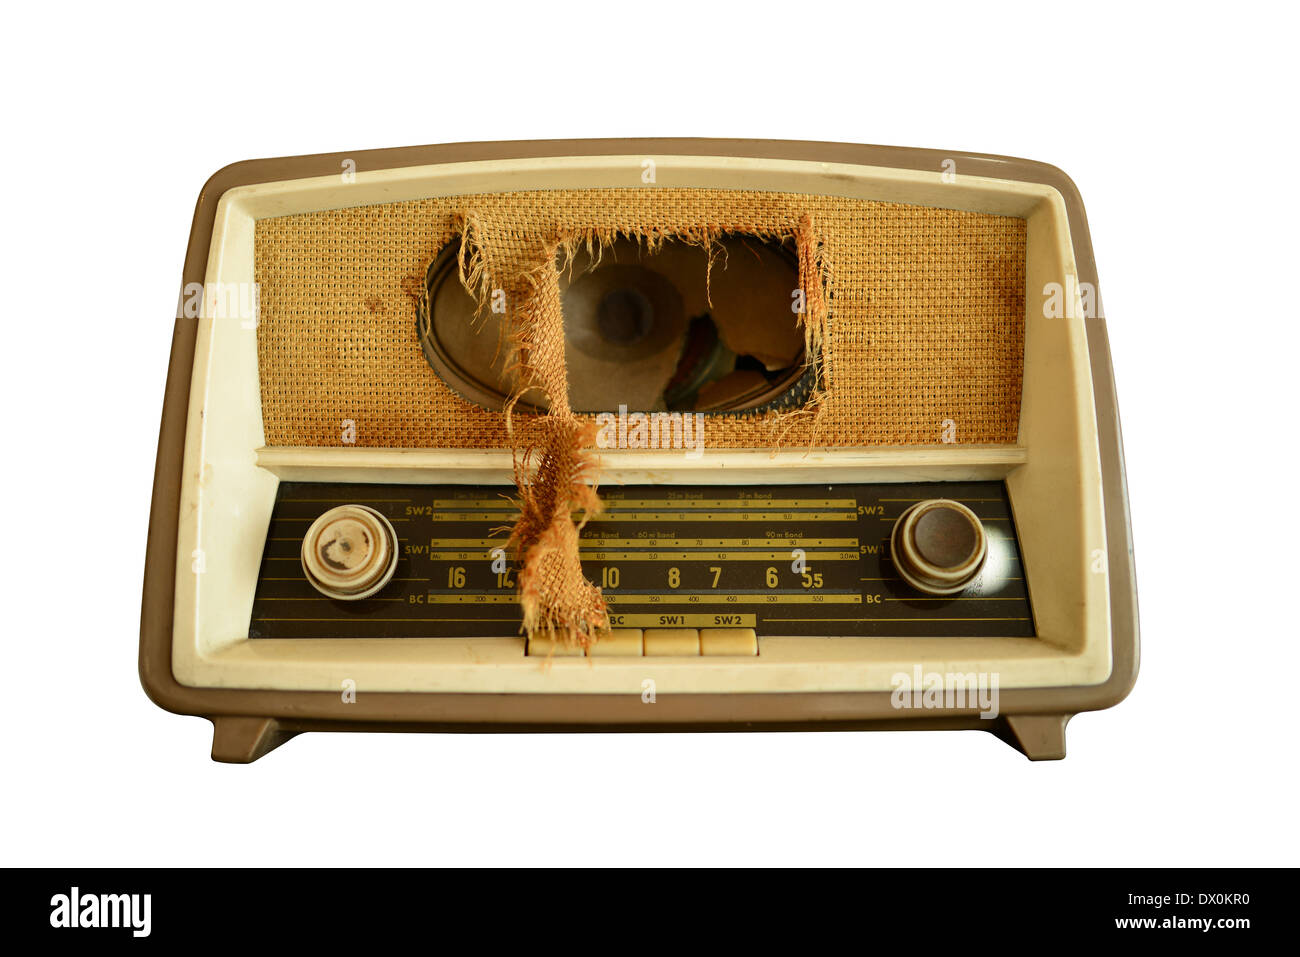 Vintage radio clipping path Stock Photo